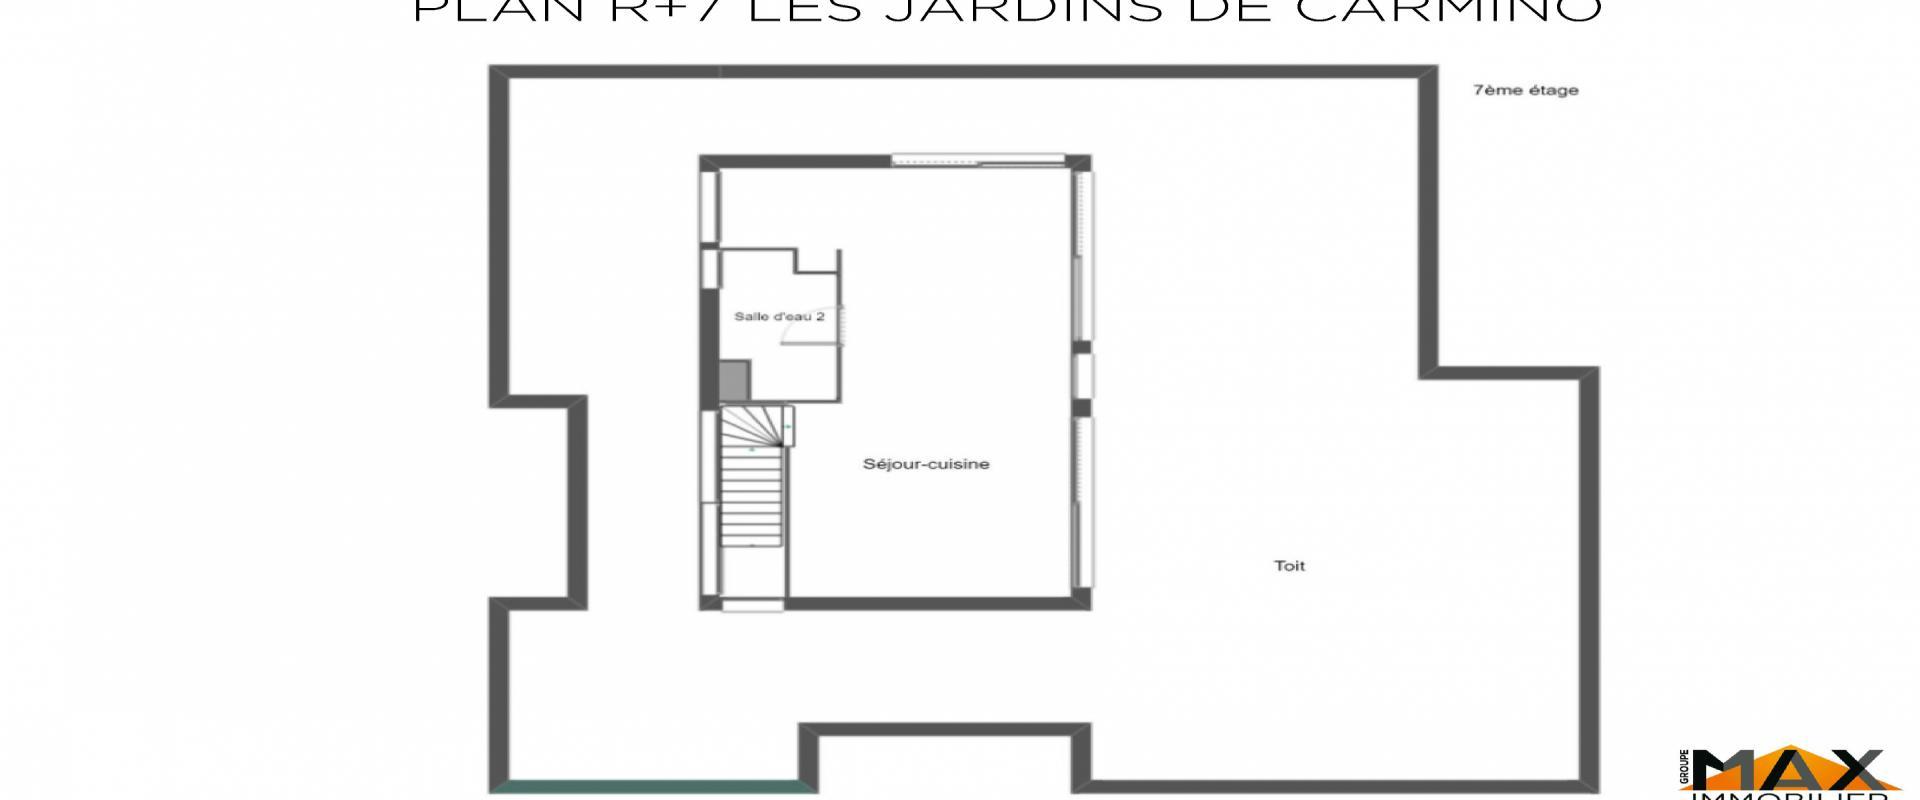 PLAN R+6 DUPLEX LES JARDINS DE CARMINO